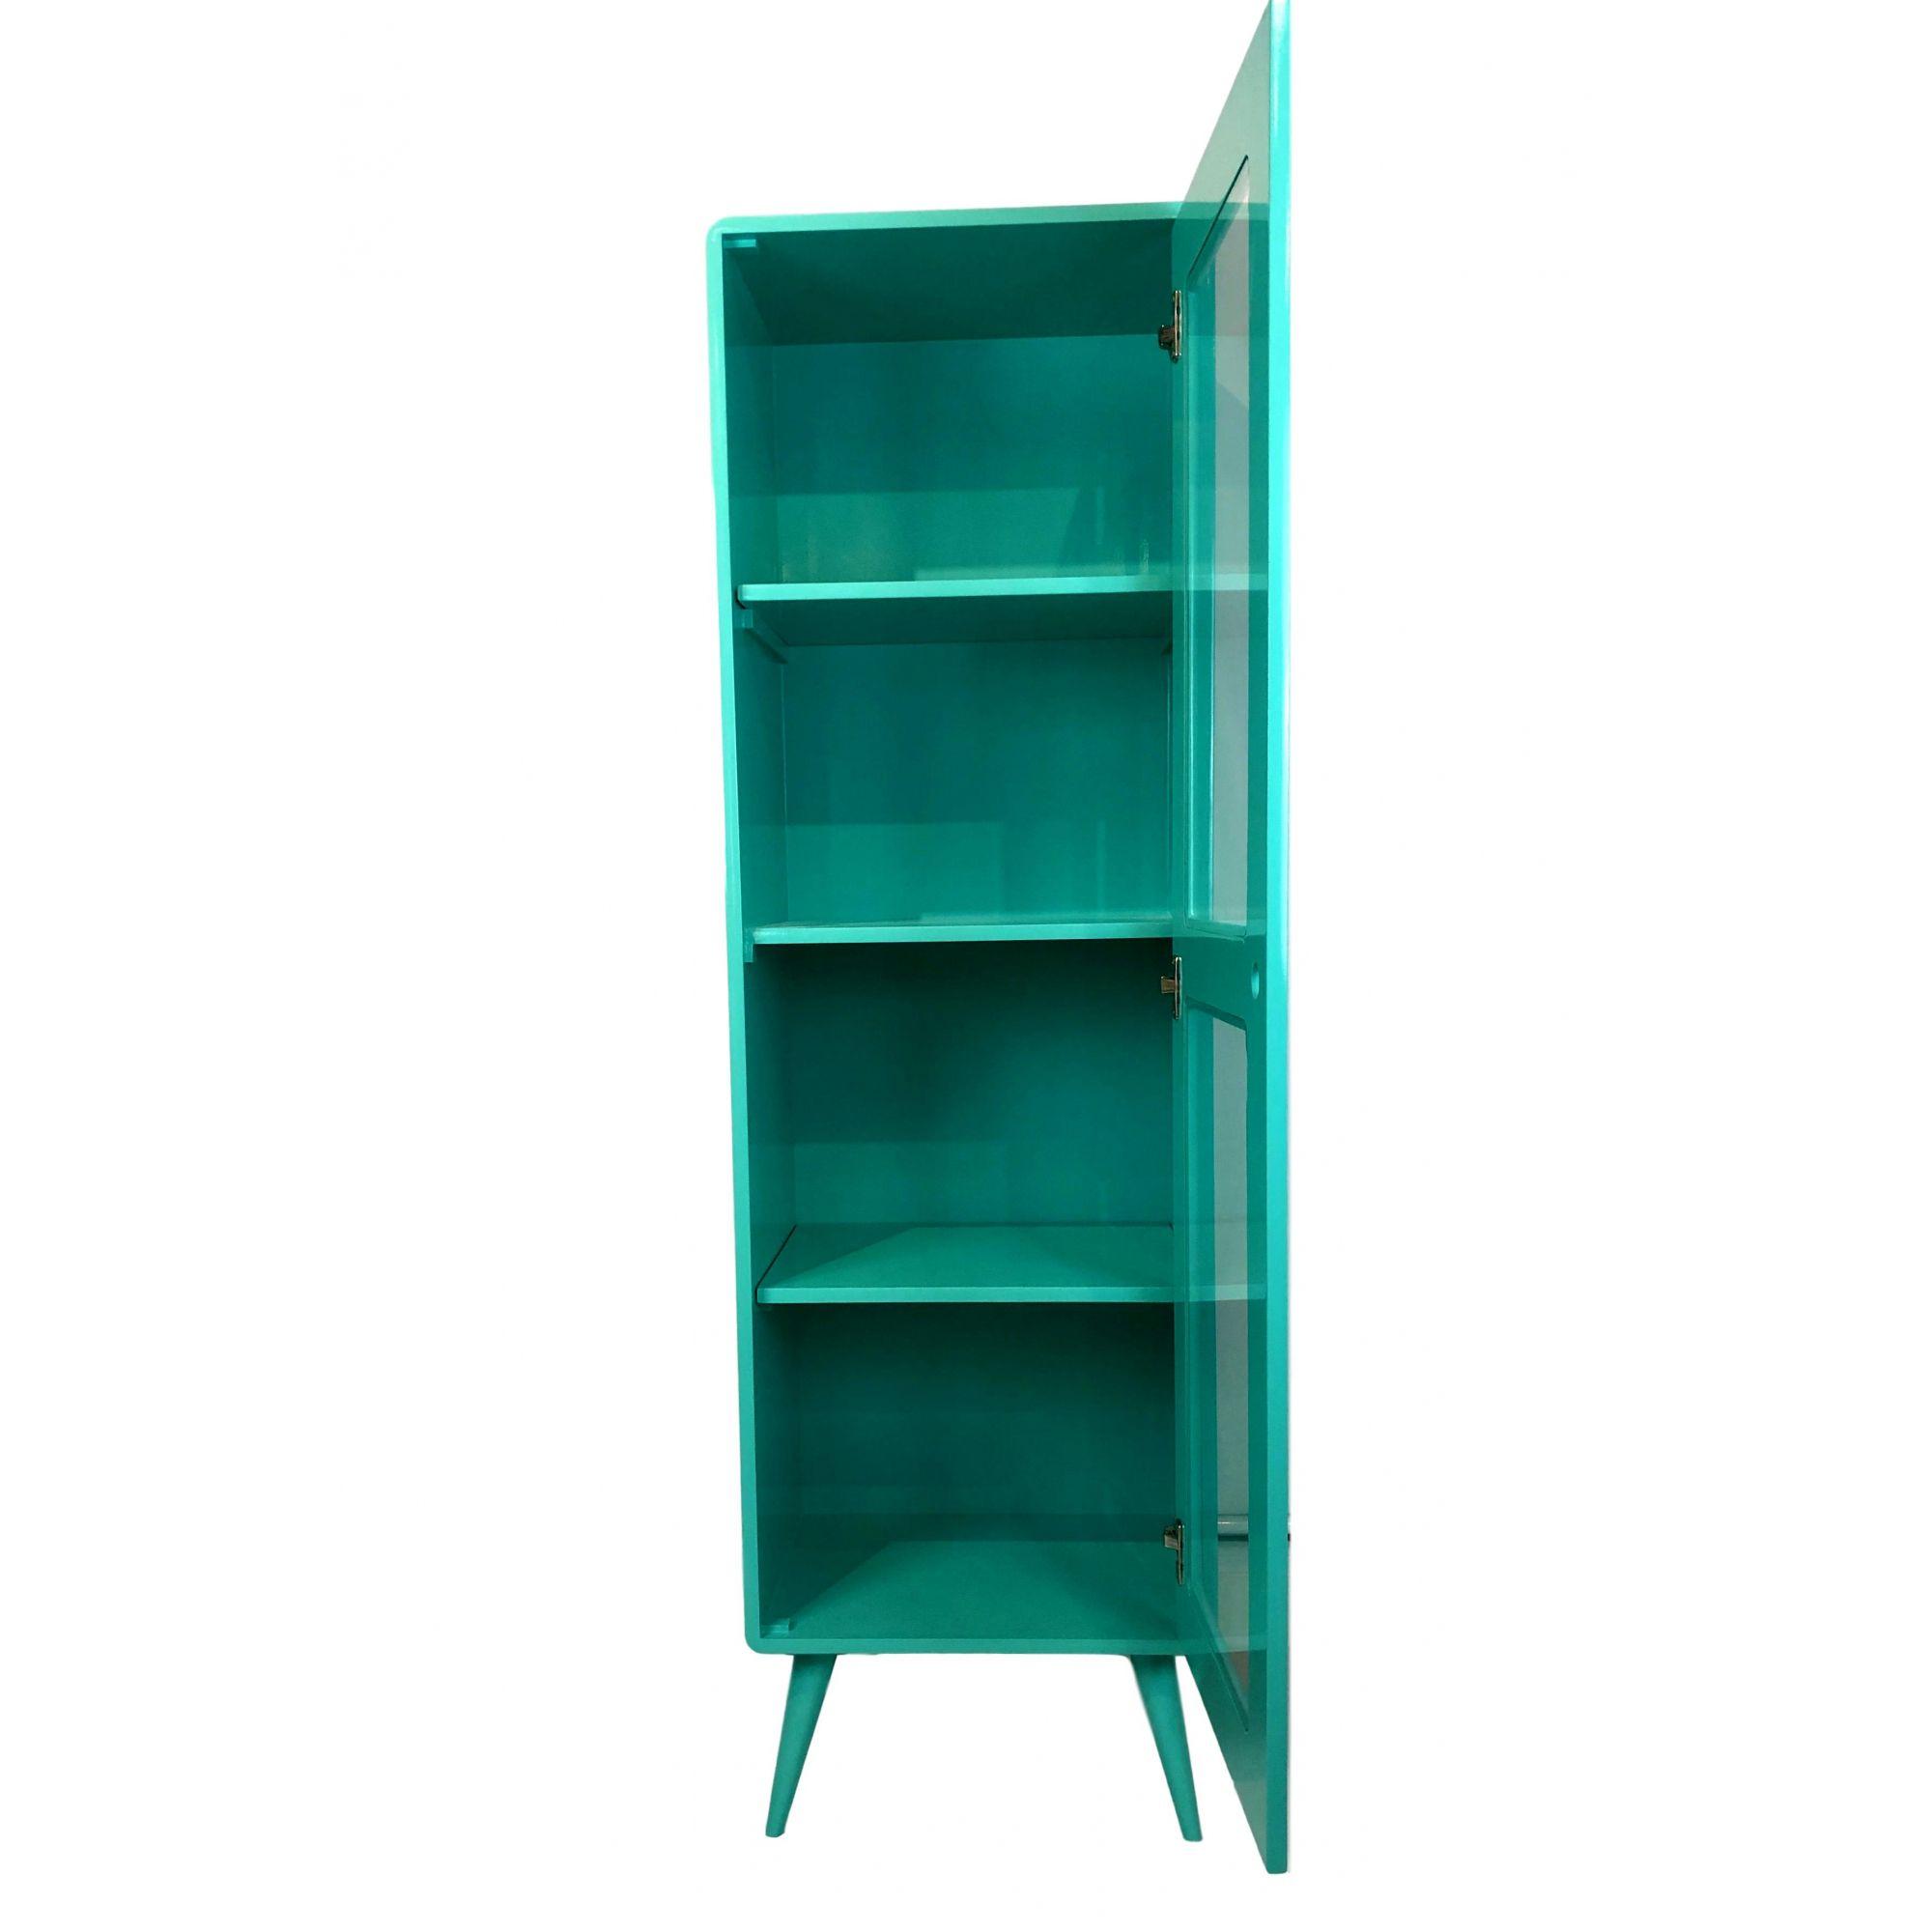 Cristaleira Pé Palito 1 porta Azul Turquesa